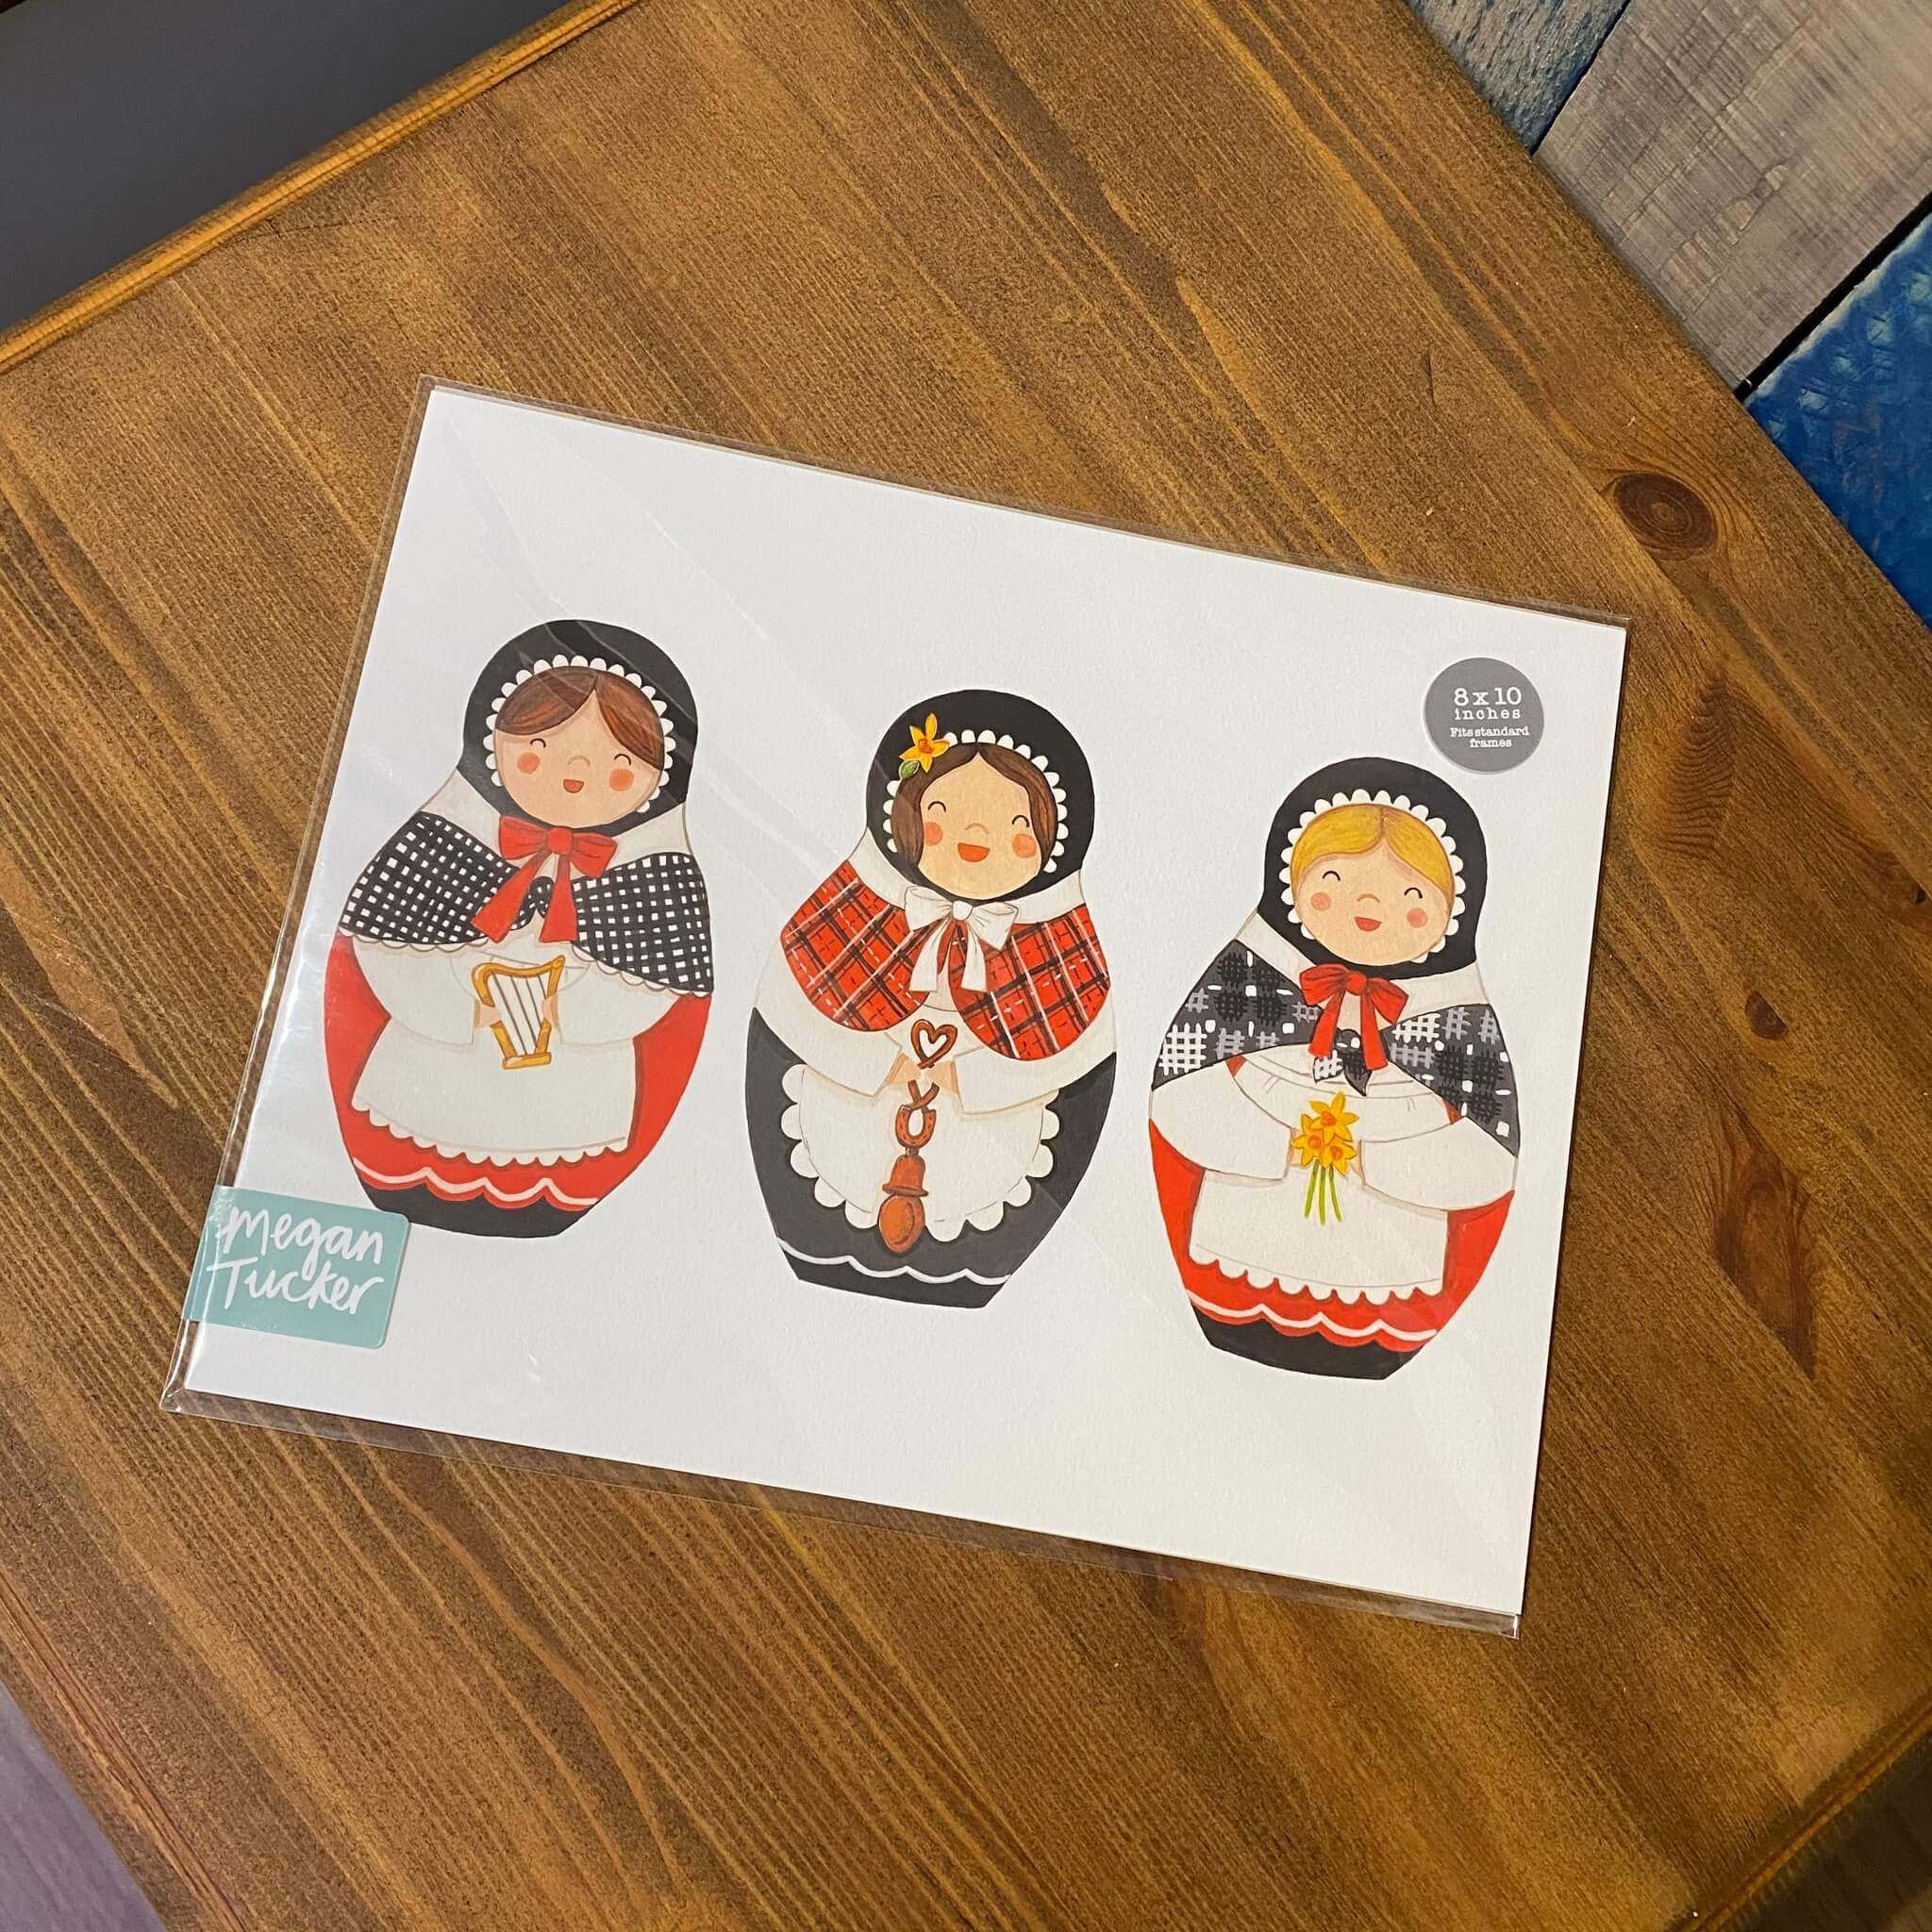 Welsh Doll Print